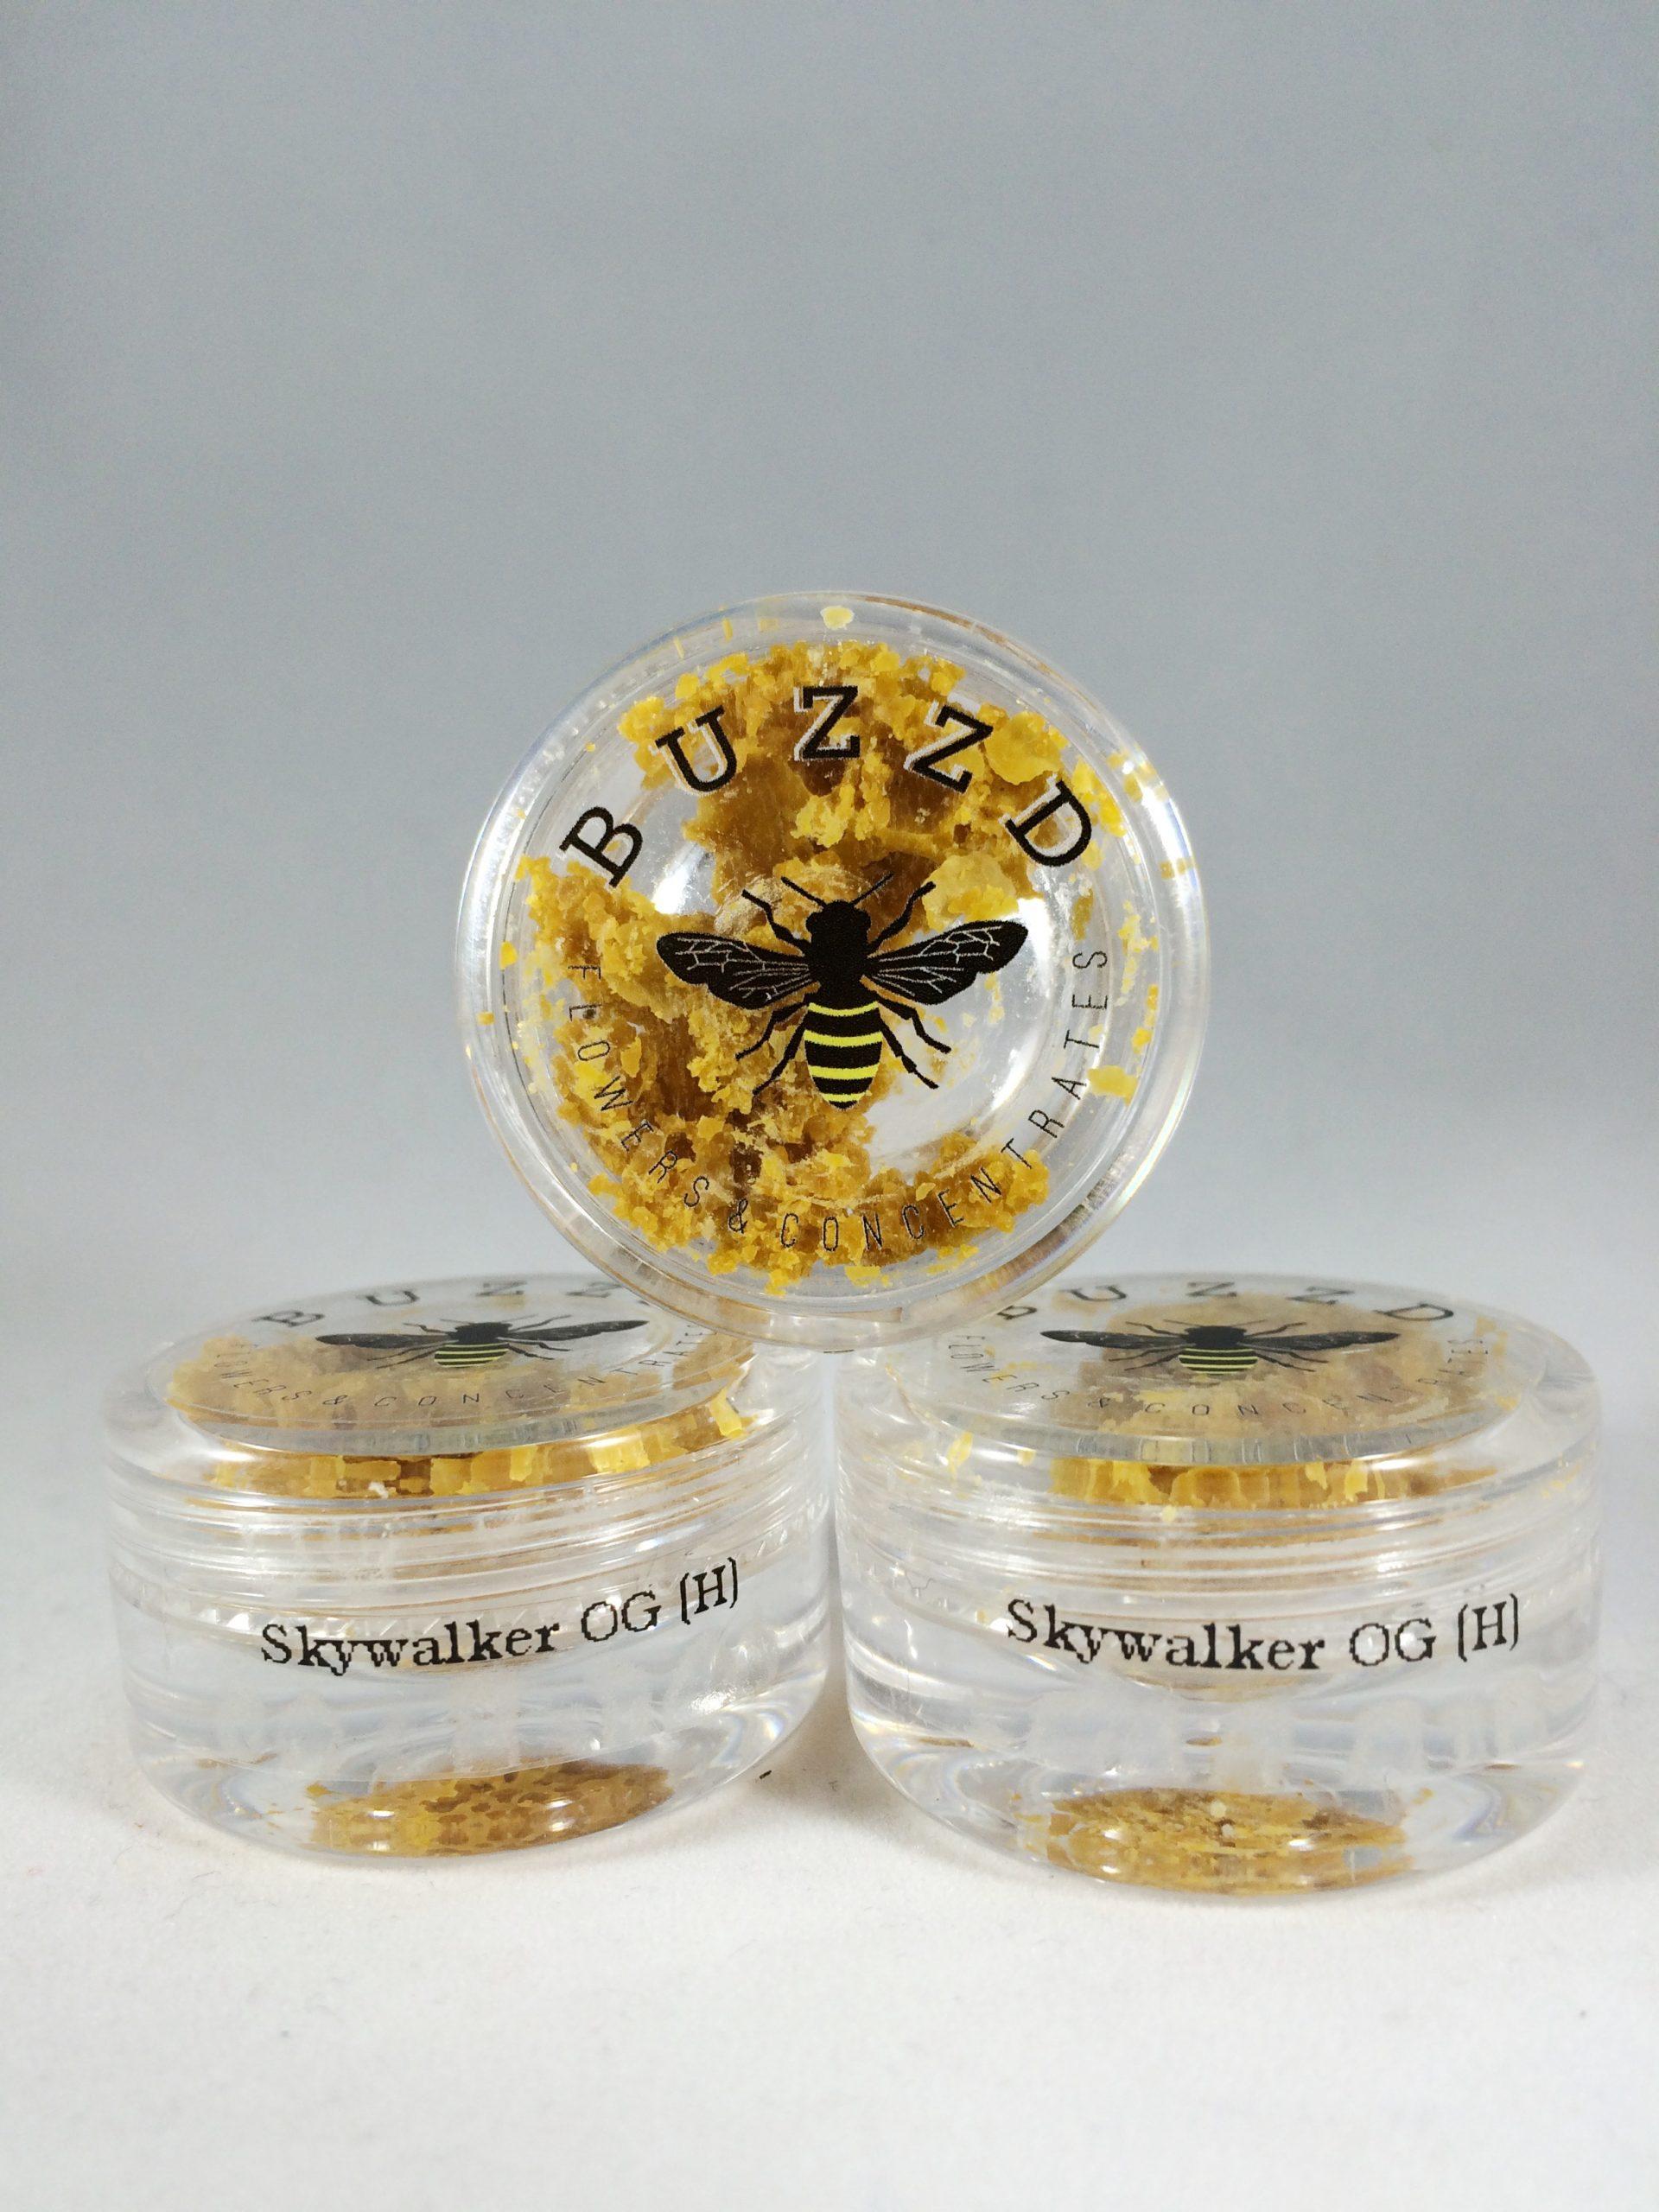 menu wax and extracts buzz d skywalker hybrid bud man